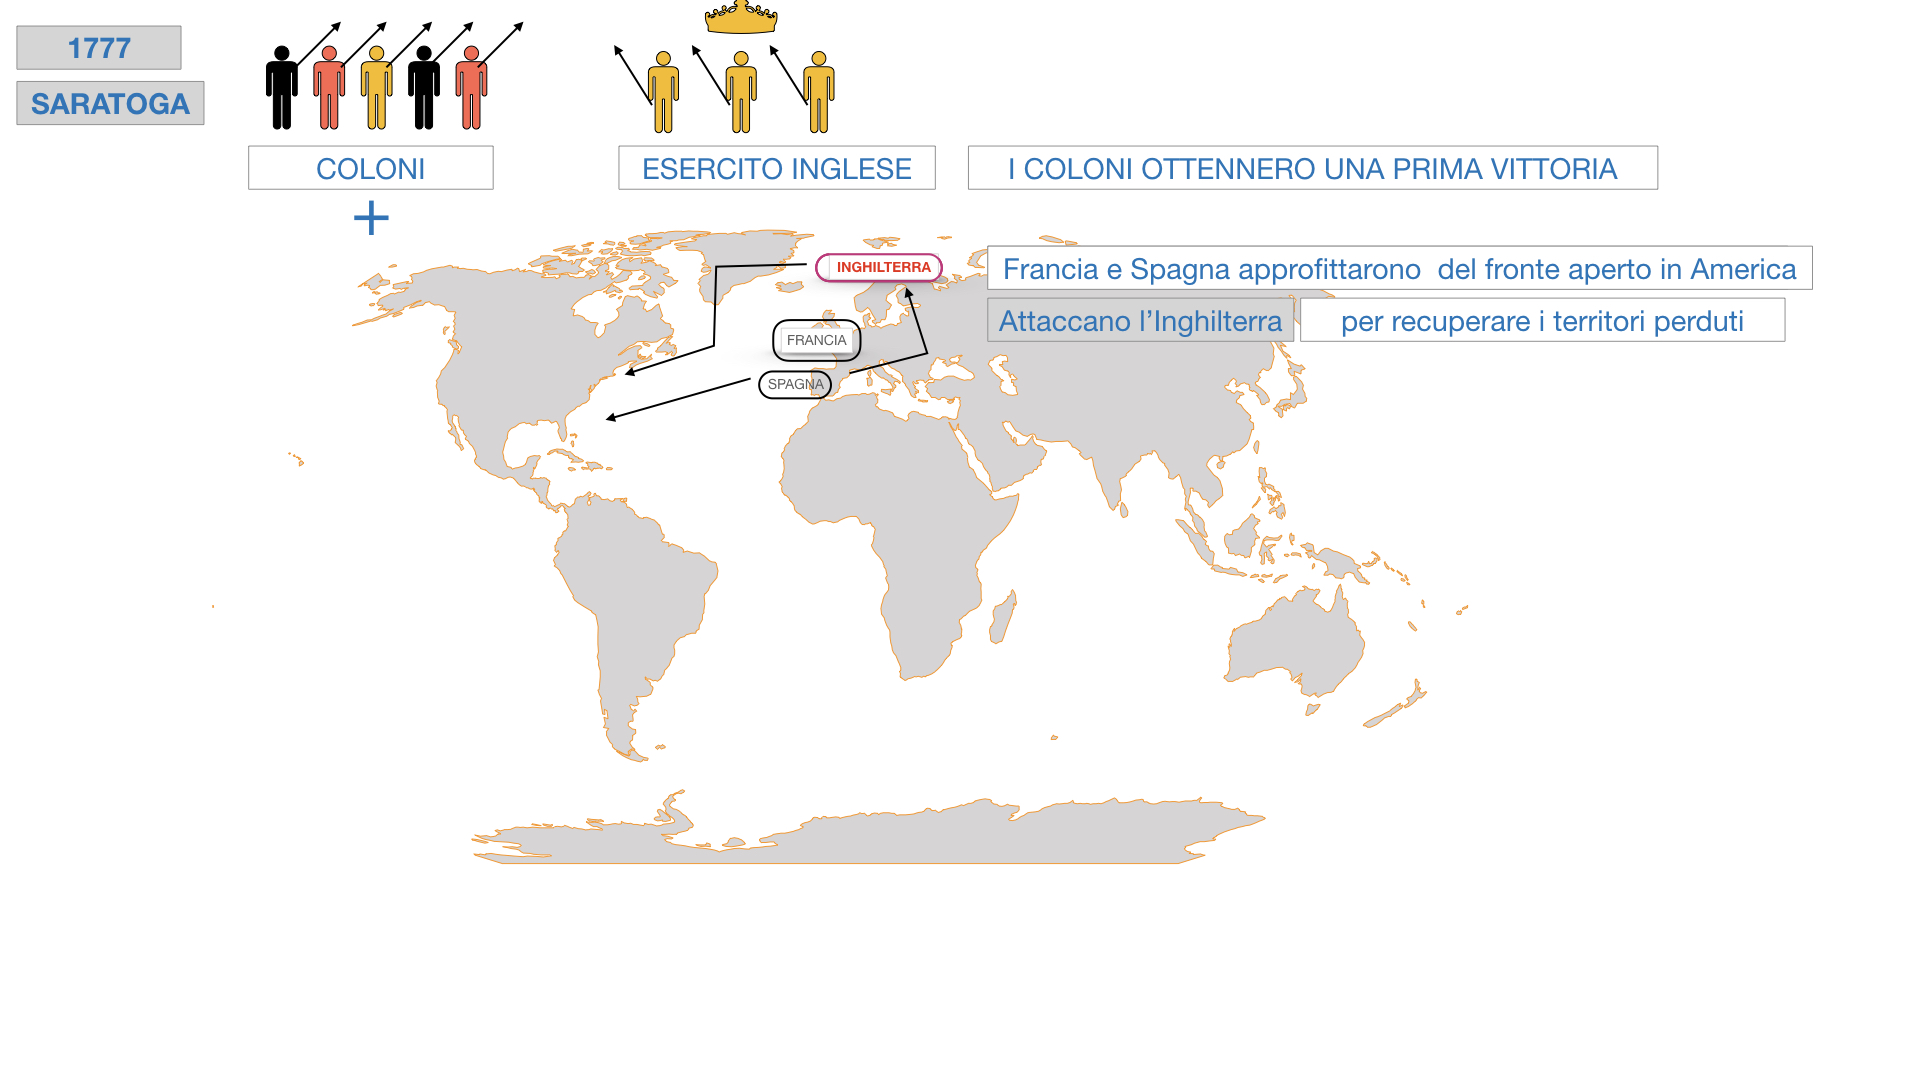 GUERRA DI INDIPENDENZA AMERICANA_SIMULAZIONE.127